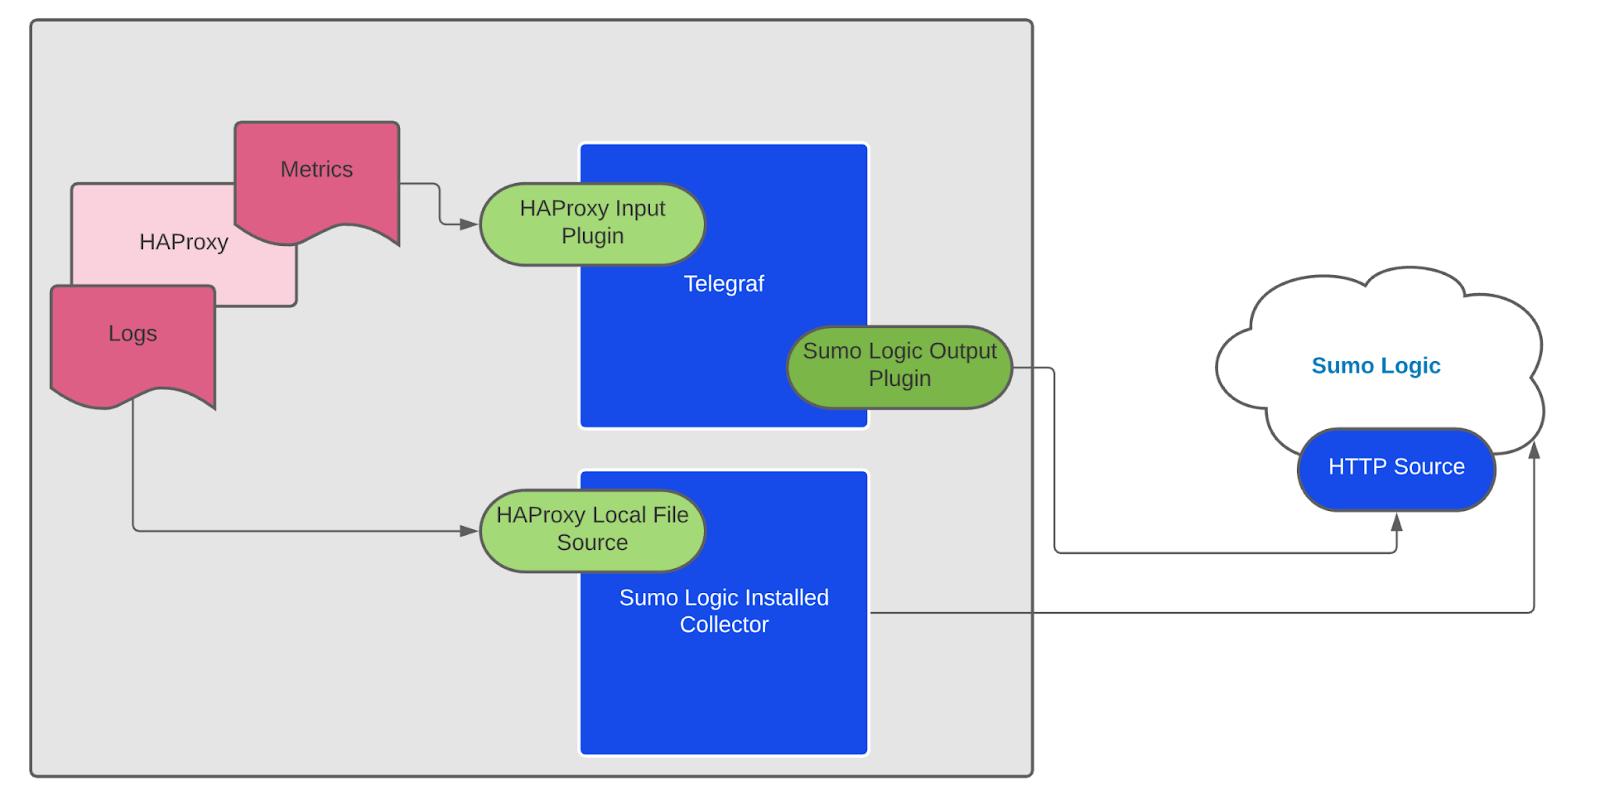 Sumo Logic Collector Process HAProxy